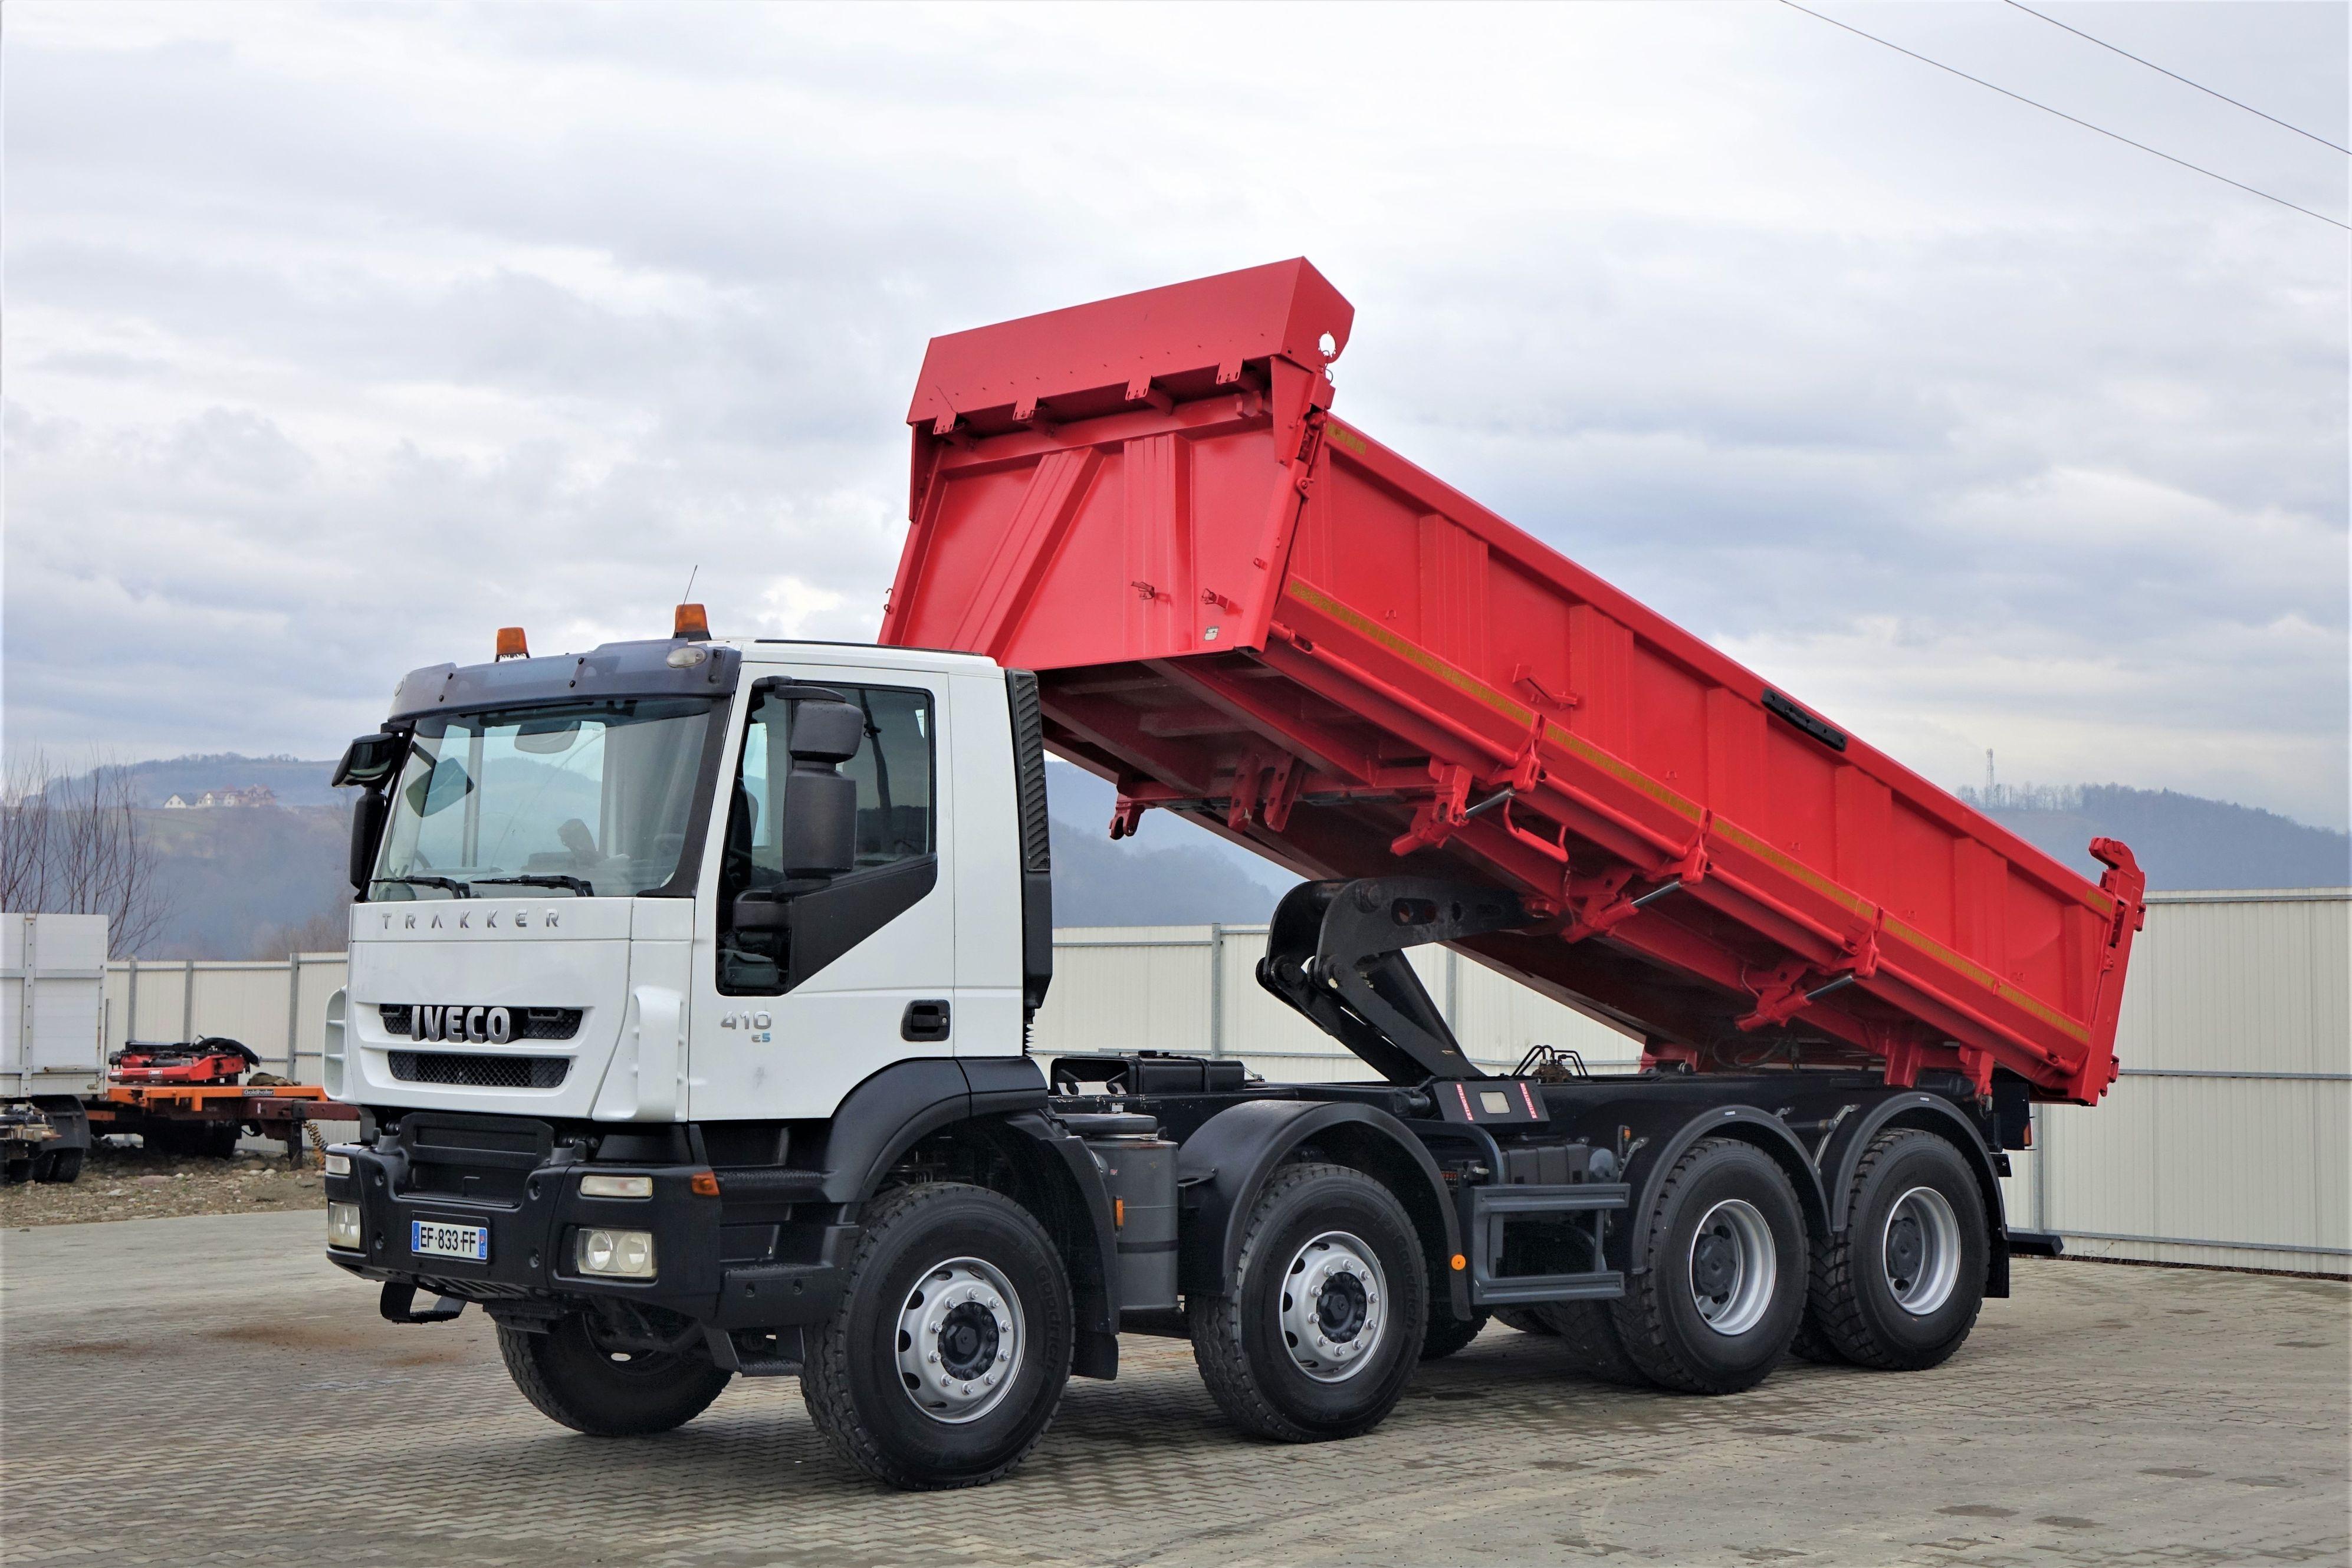 2009-iveco-trakker-410-321120-equipment-cover-image